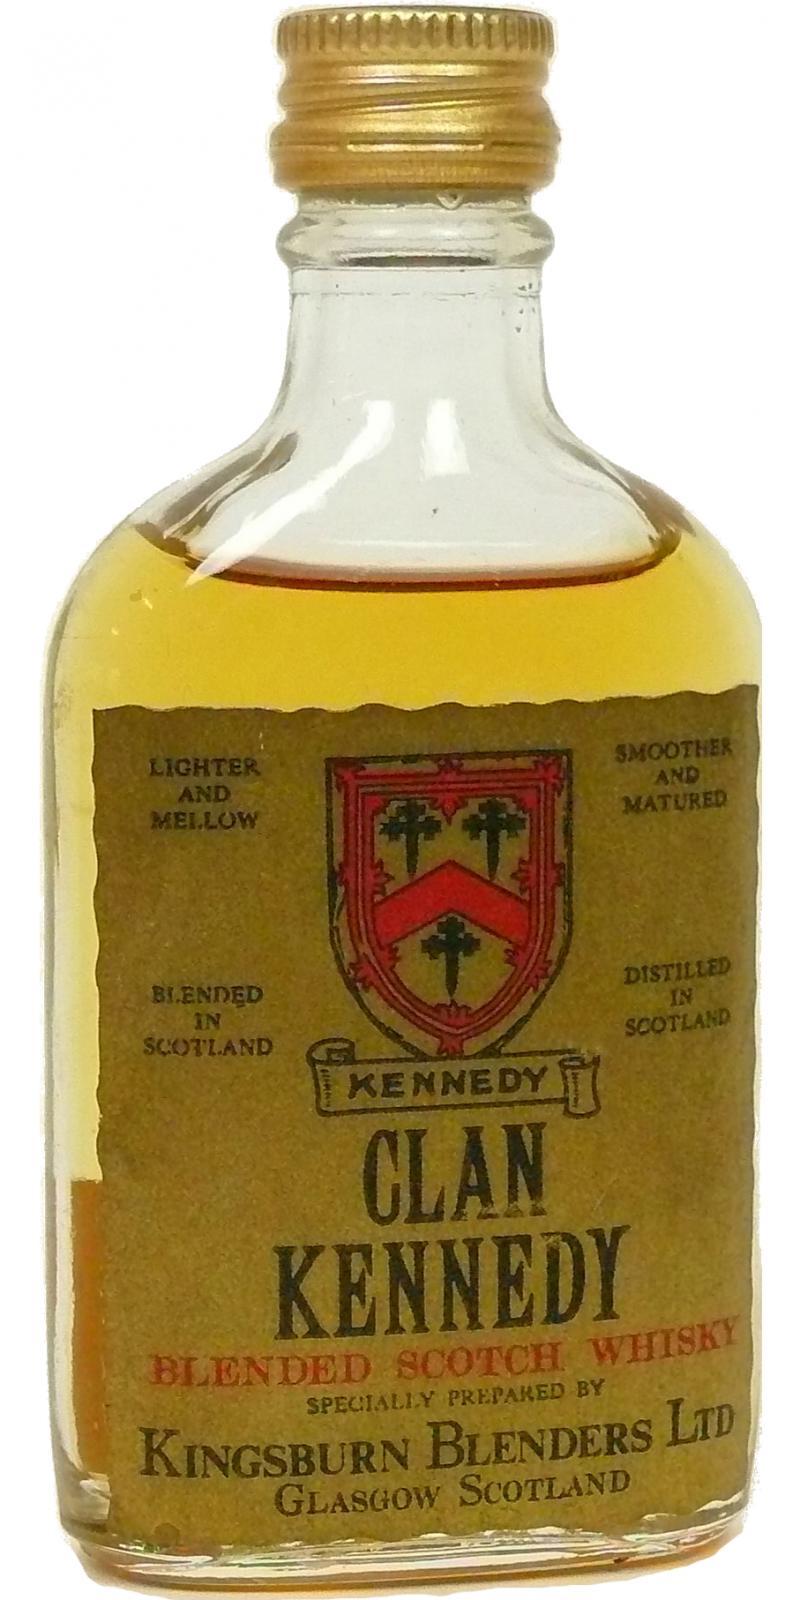 Clan Kennedy Blended Scotch Whisky